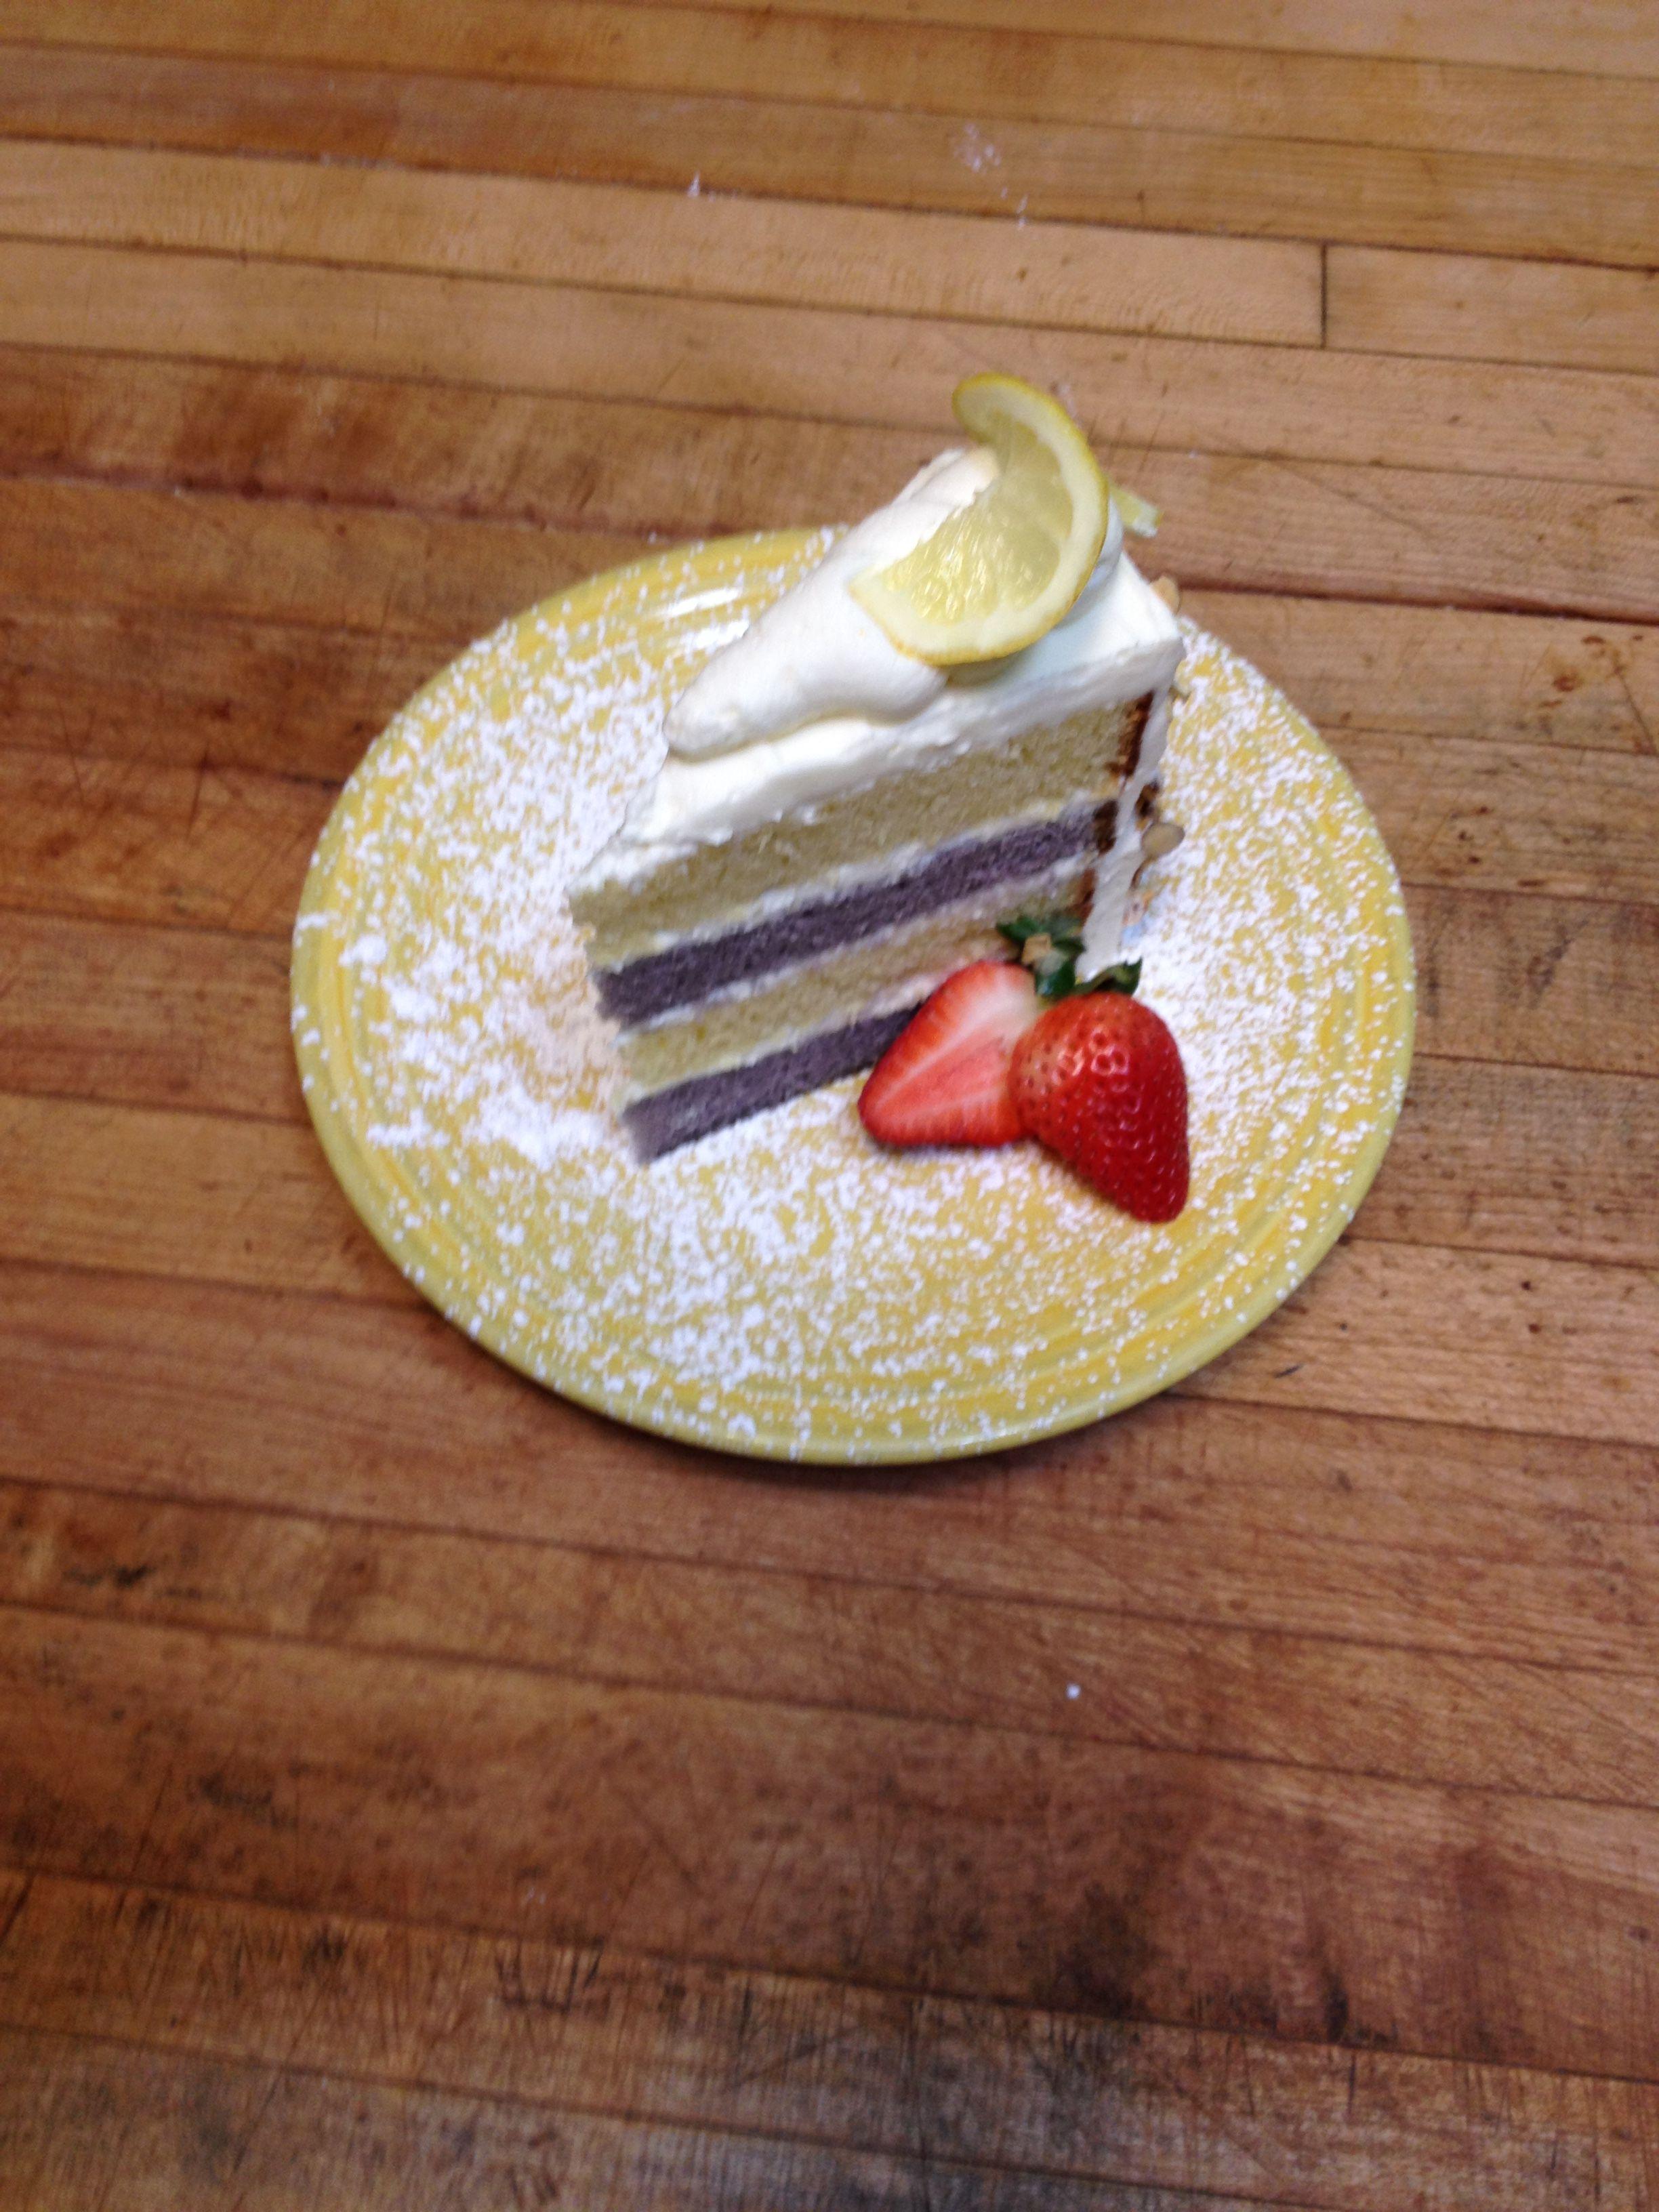 LavenderLemon Cake by David Perry Lemon cake, Lemon